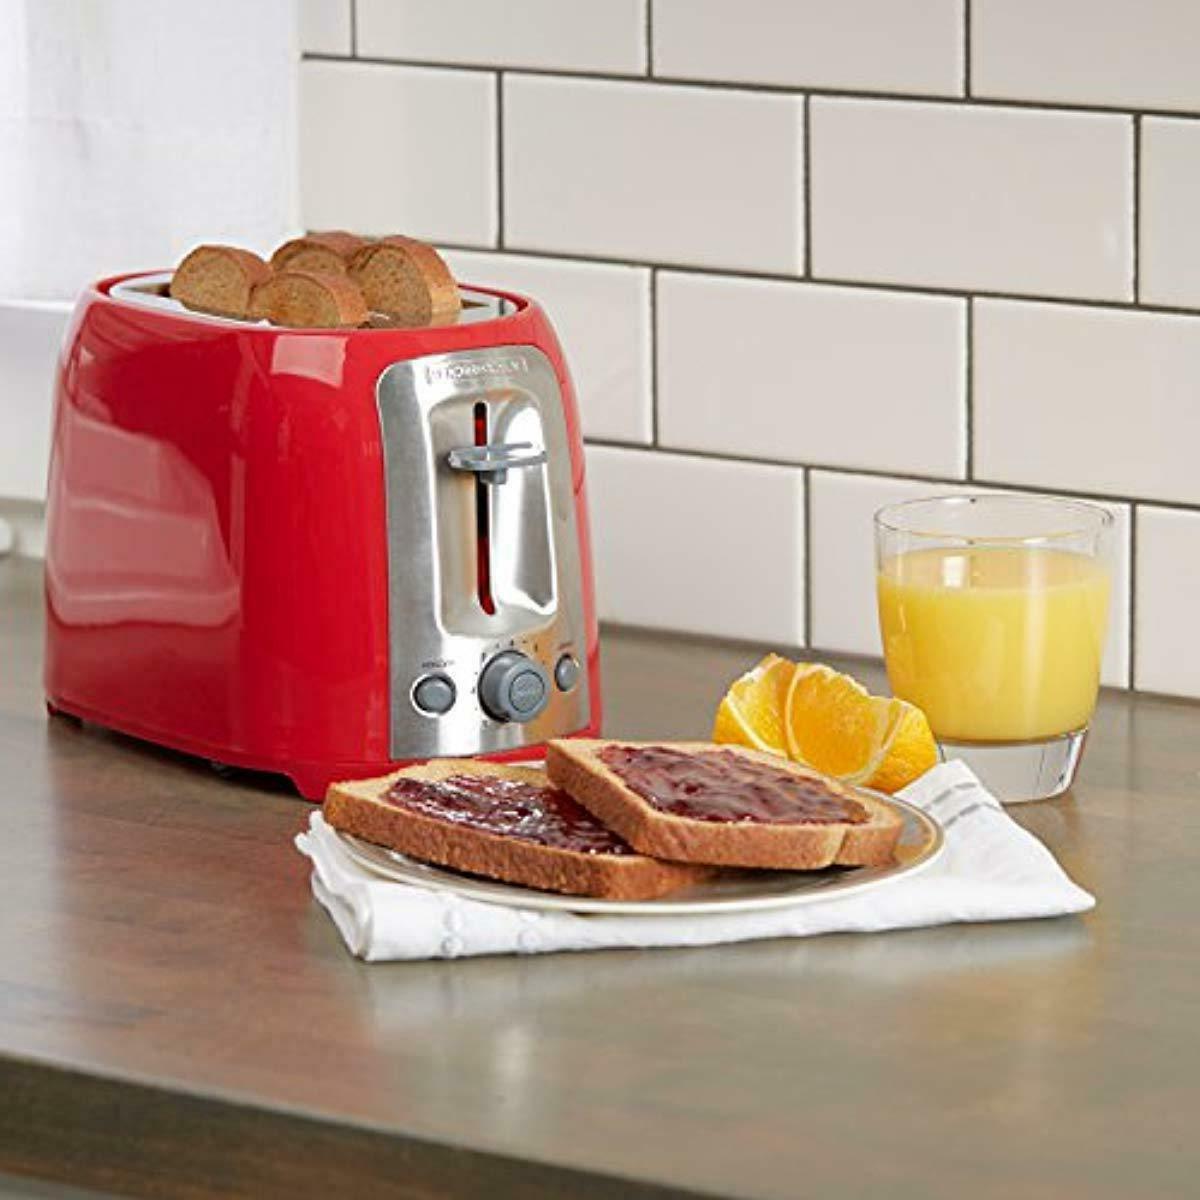 Black Slice Toaster Extra Toasting Bread Toasters Red